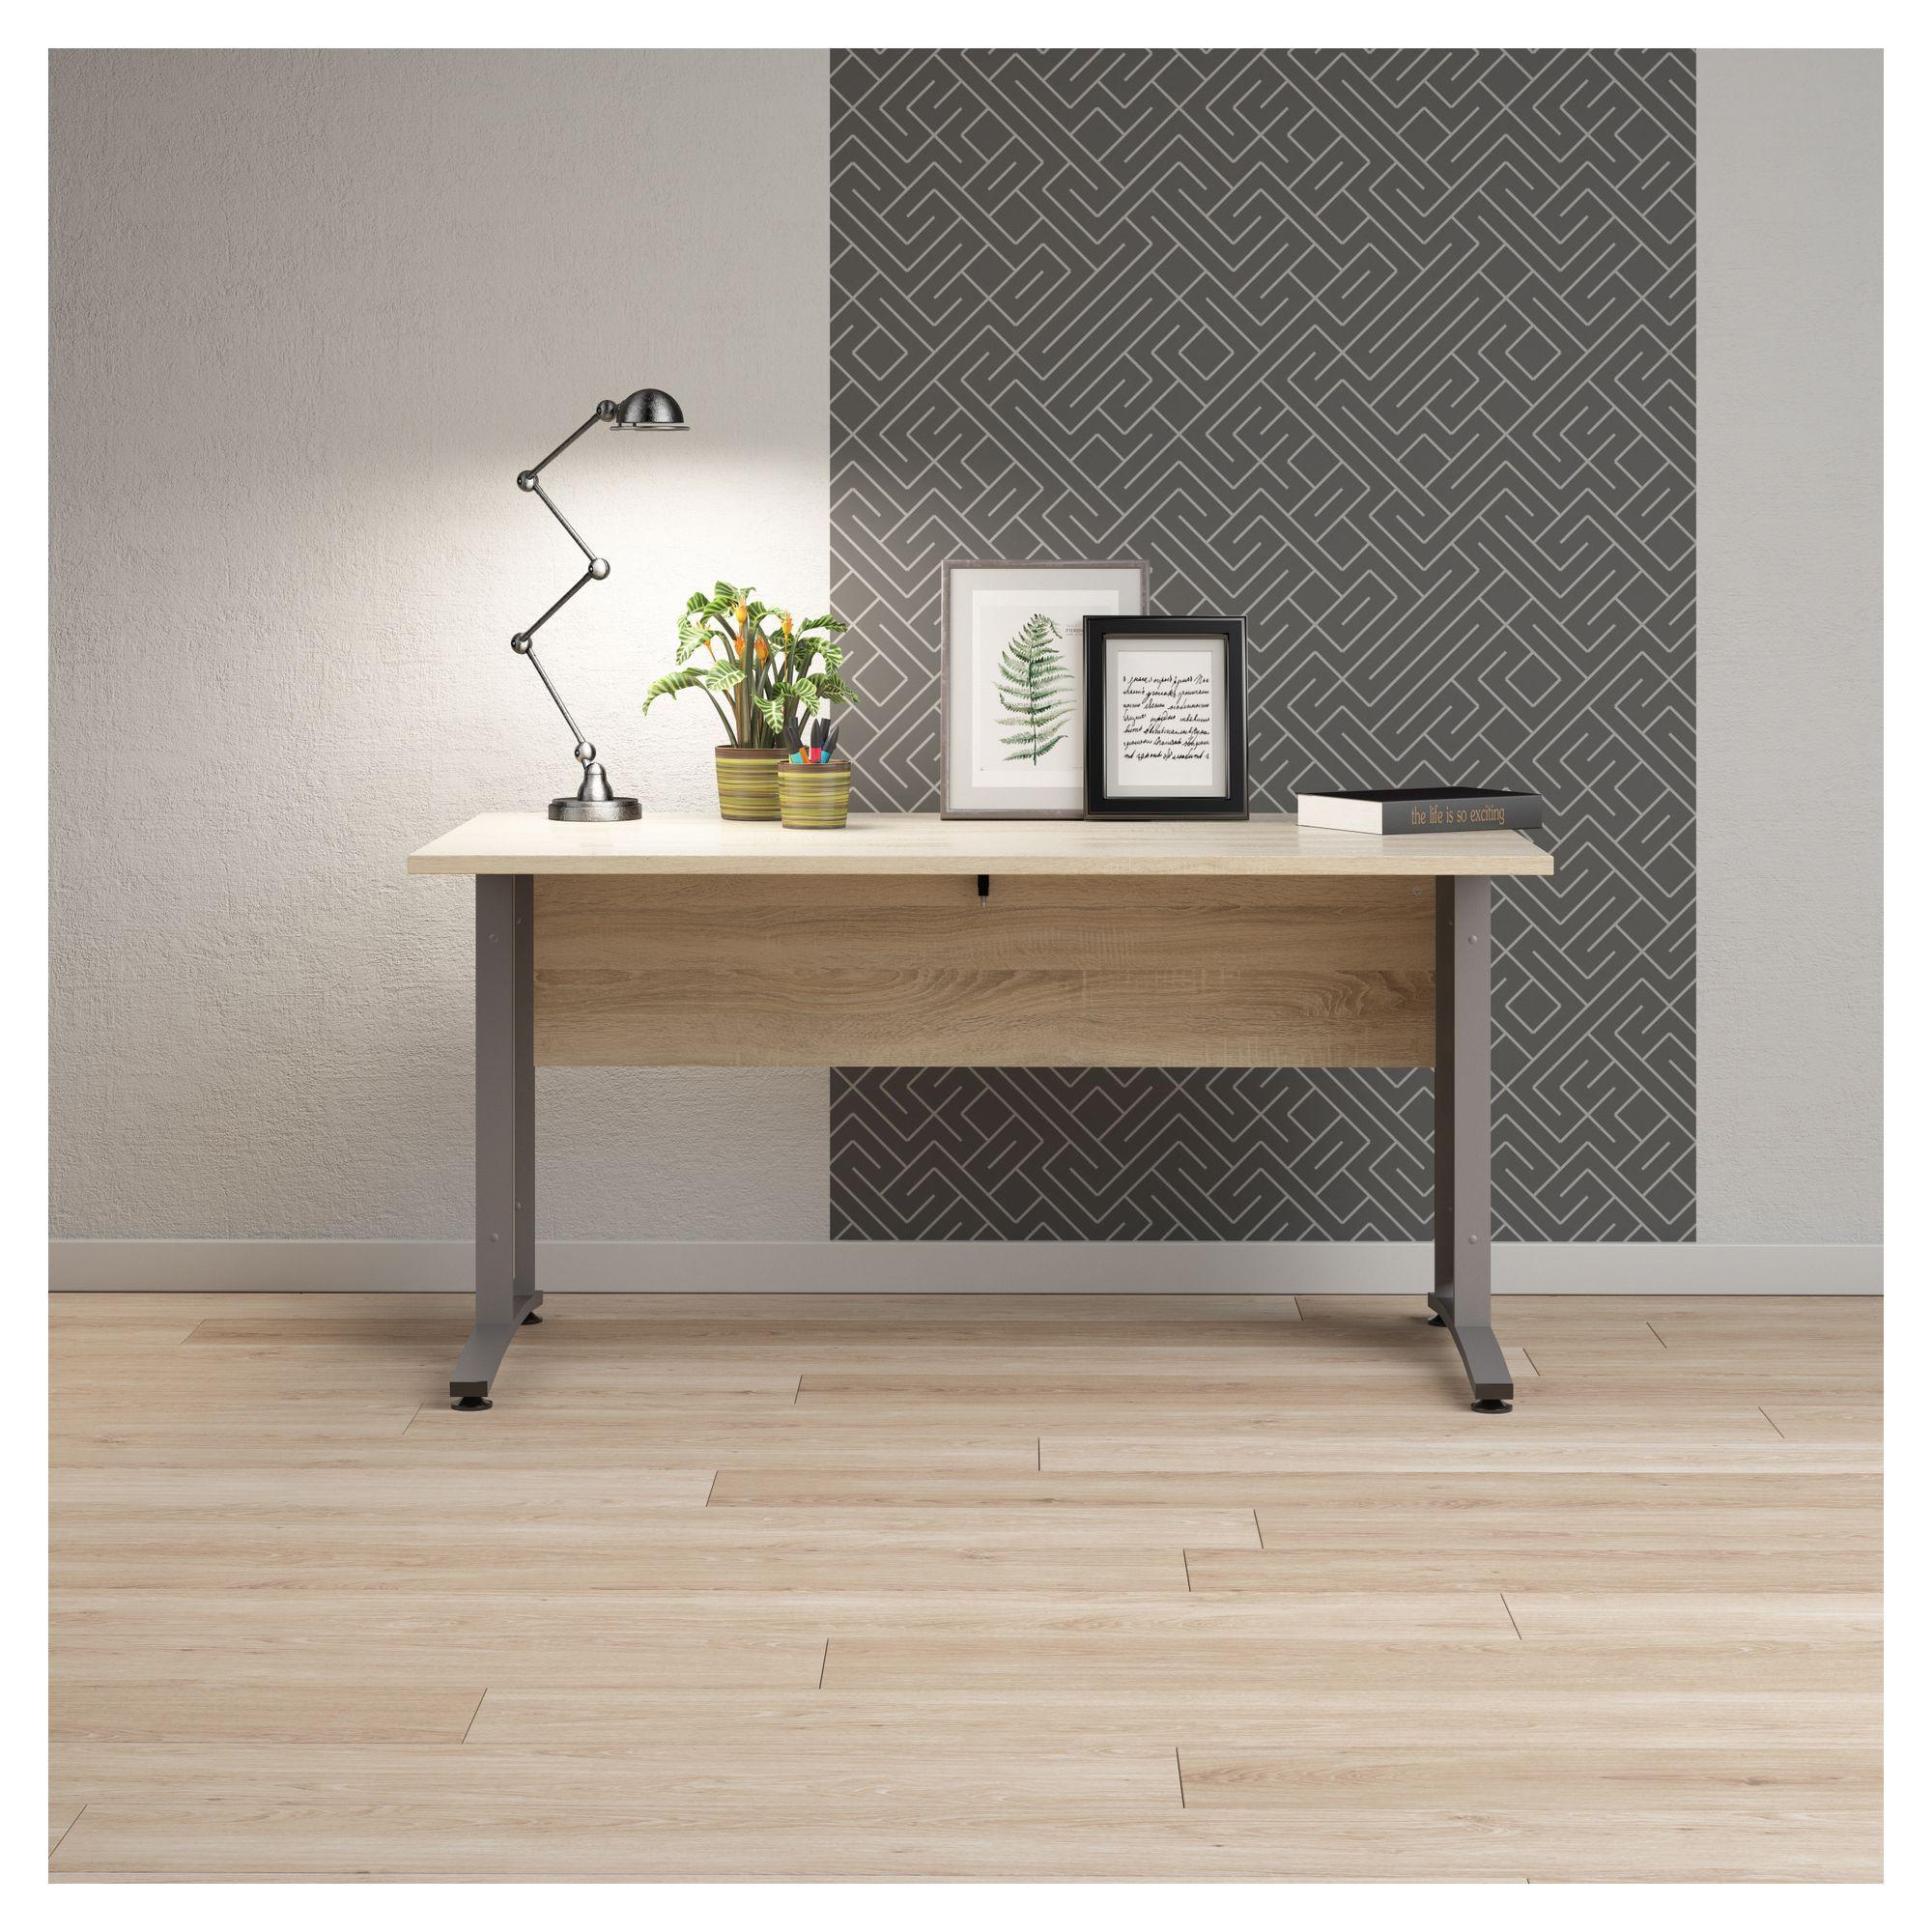 Prima Skrivebord - Lys træ 150cm m/metalben - Skrivebord med egetræslook